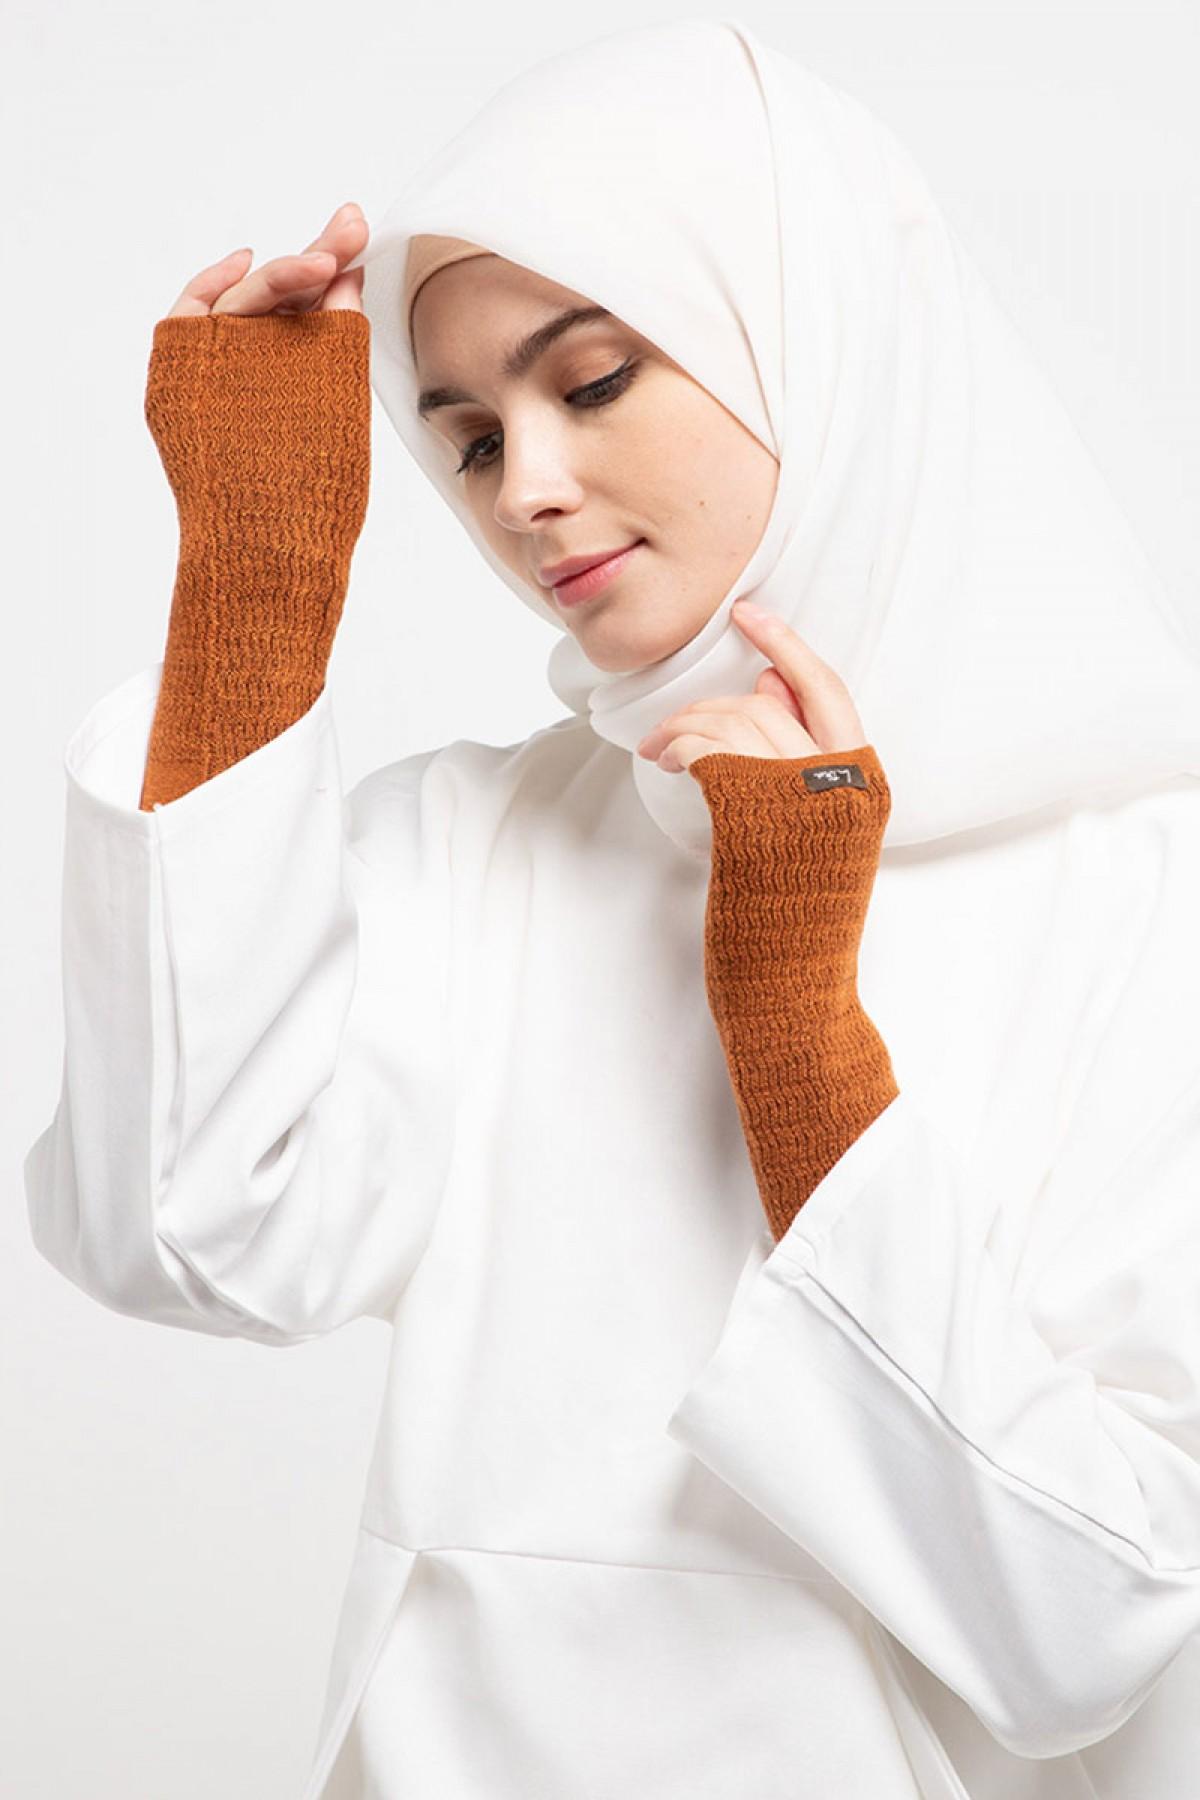 Long Handsocks Knitting Overset Terracota - L.tru